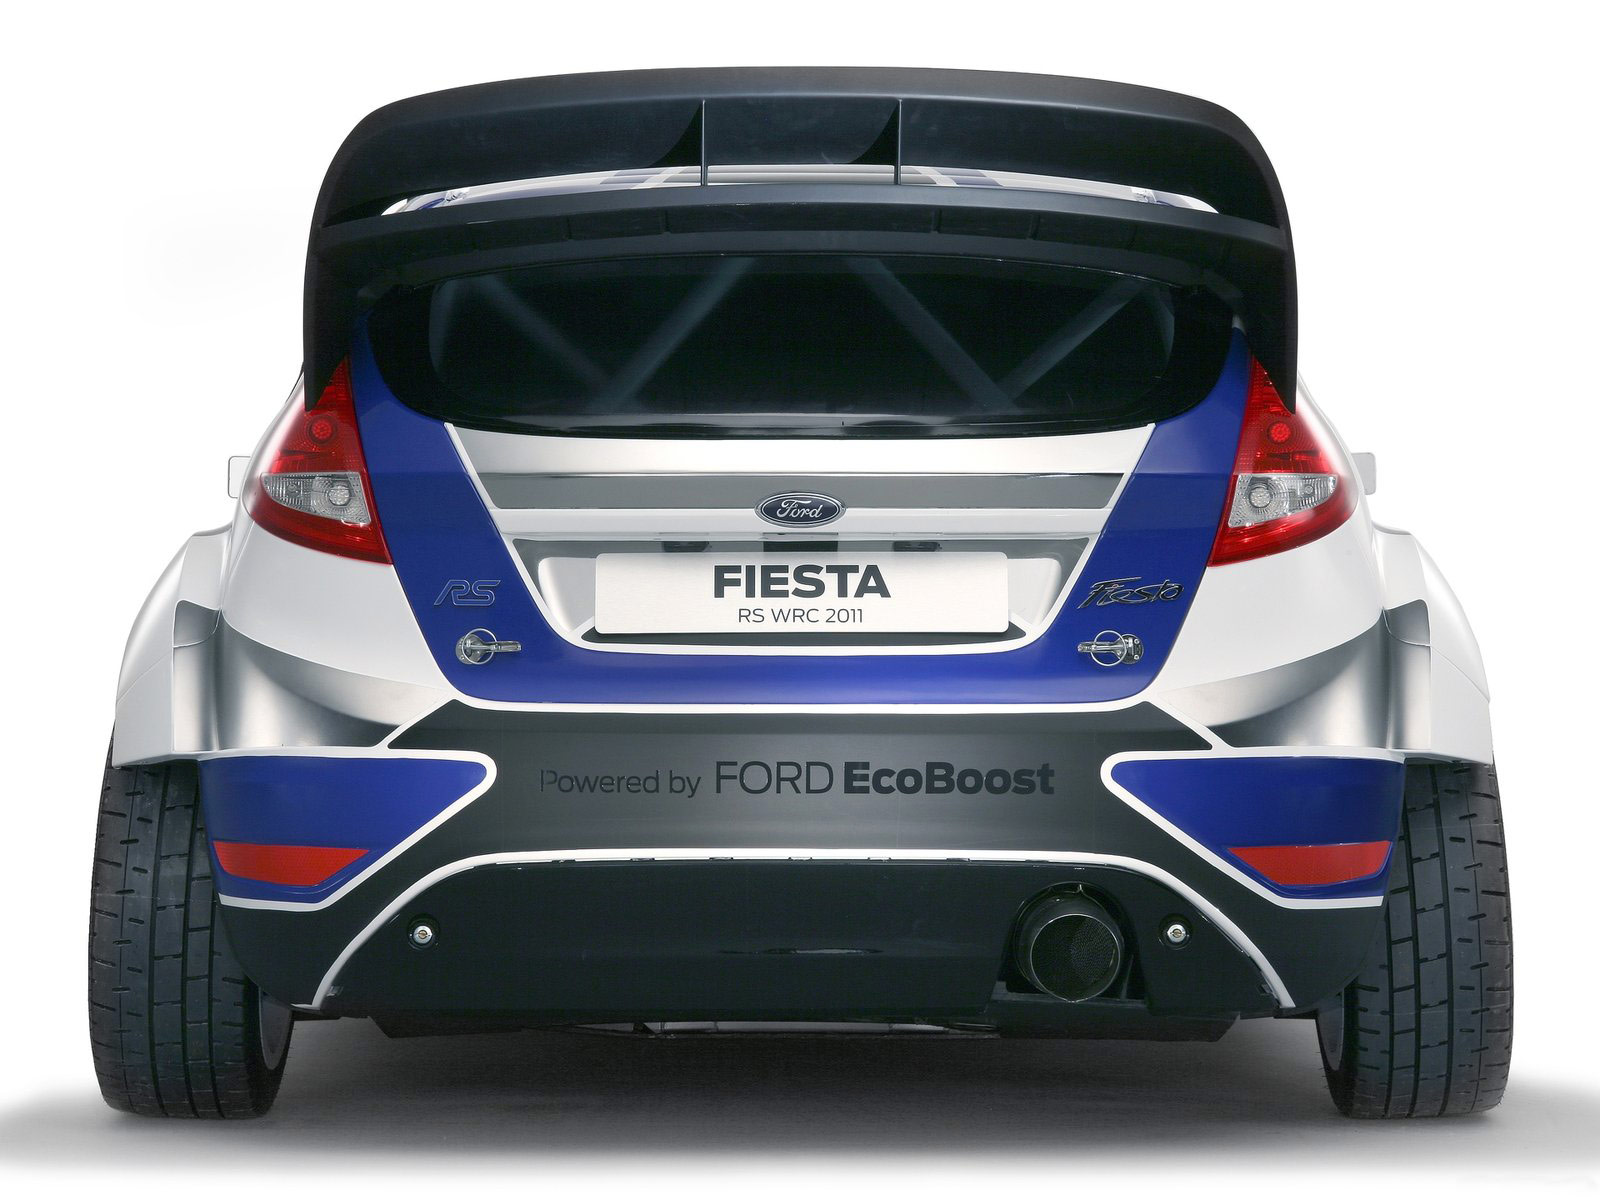 Gambar Mobil FORD Fiesta RS WRC 2011